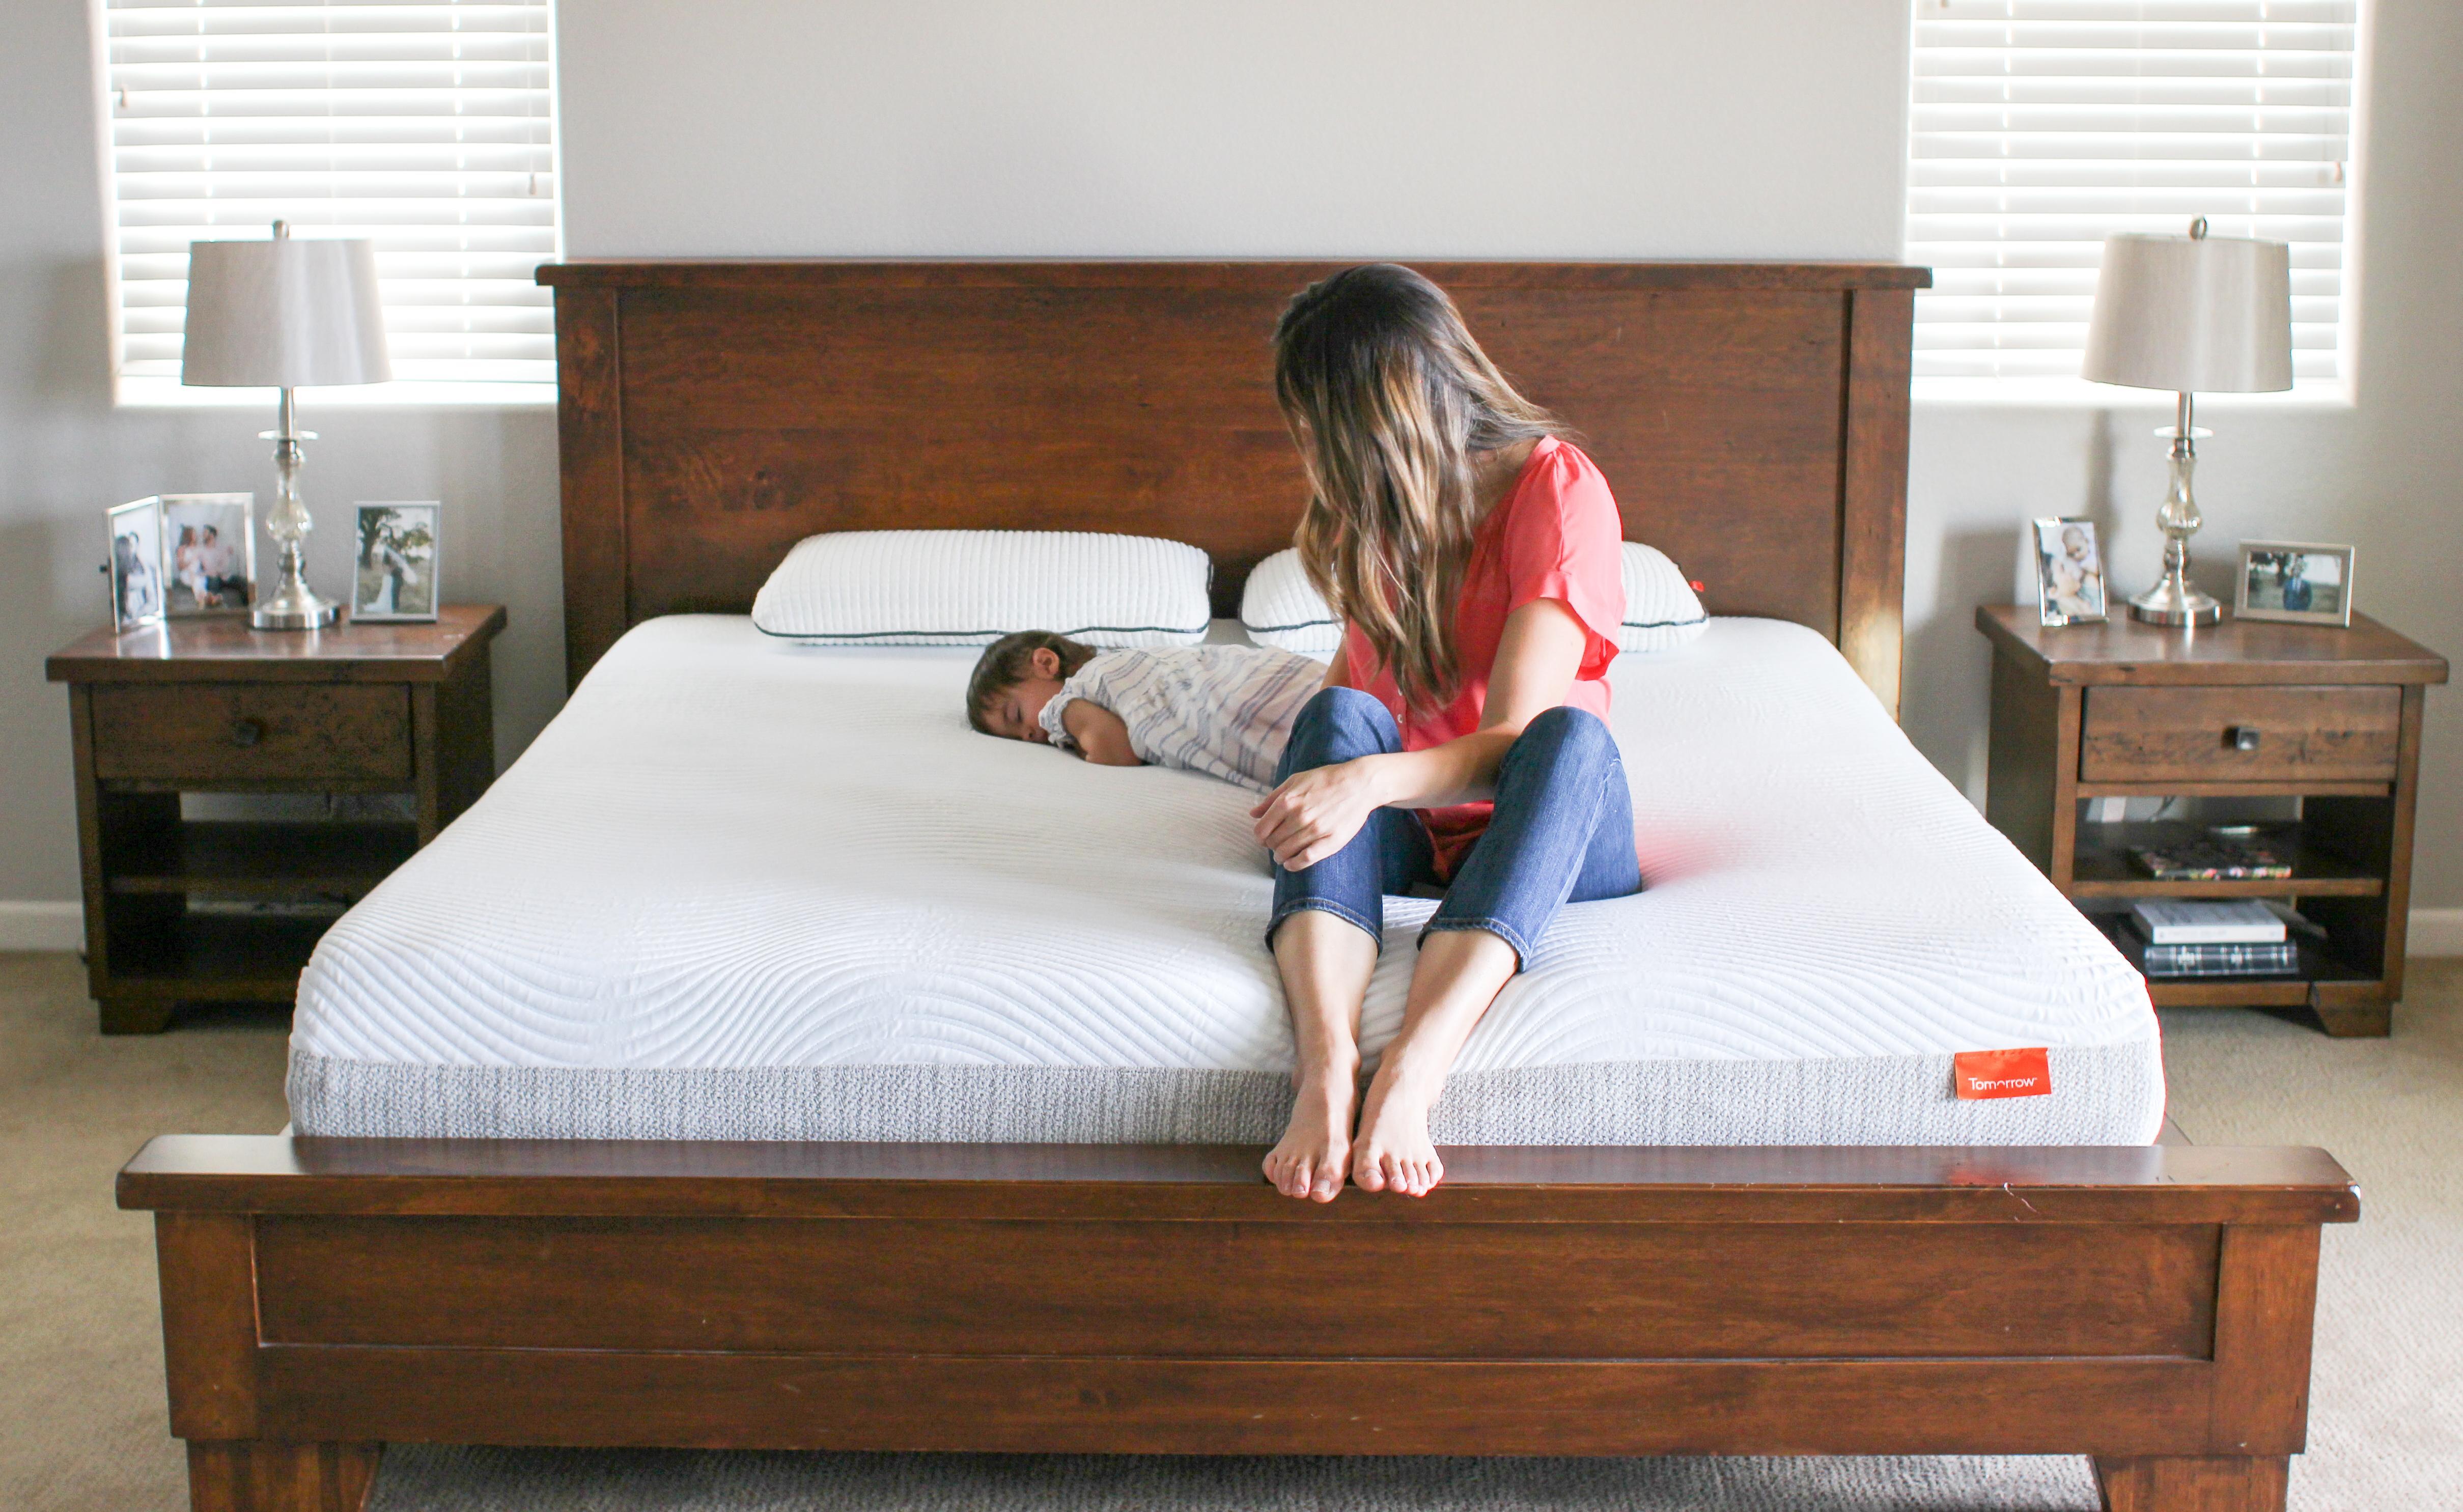 Memory foam hybrid mattress the best memory foam mattress the best hybrid mattress